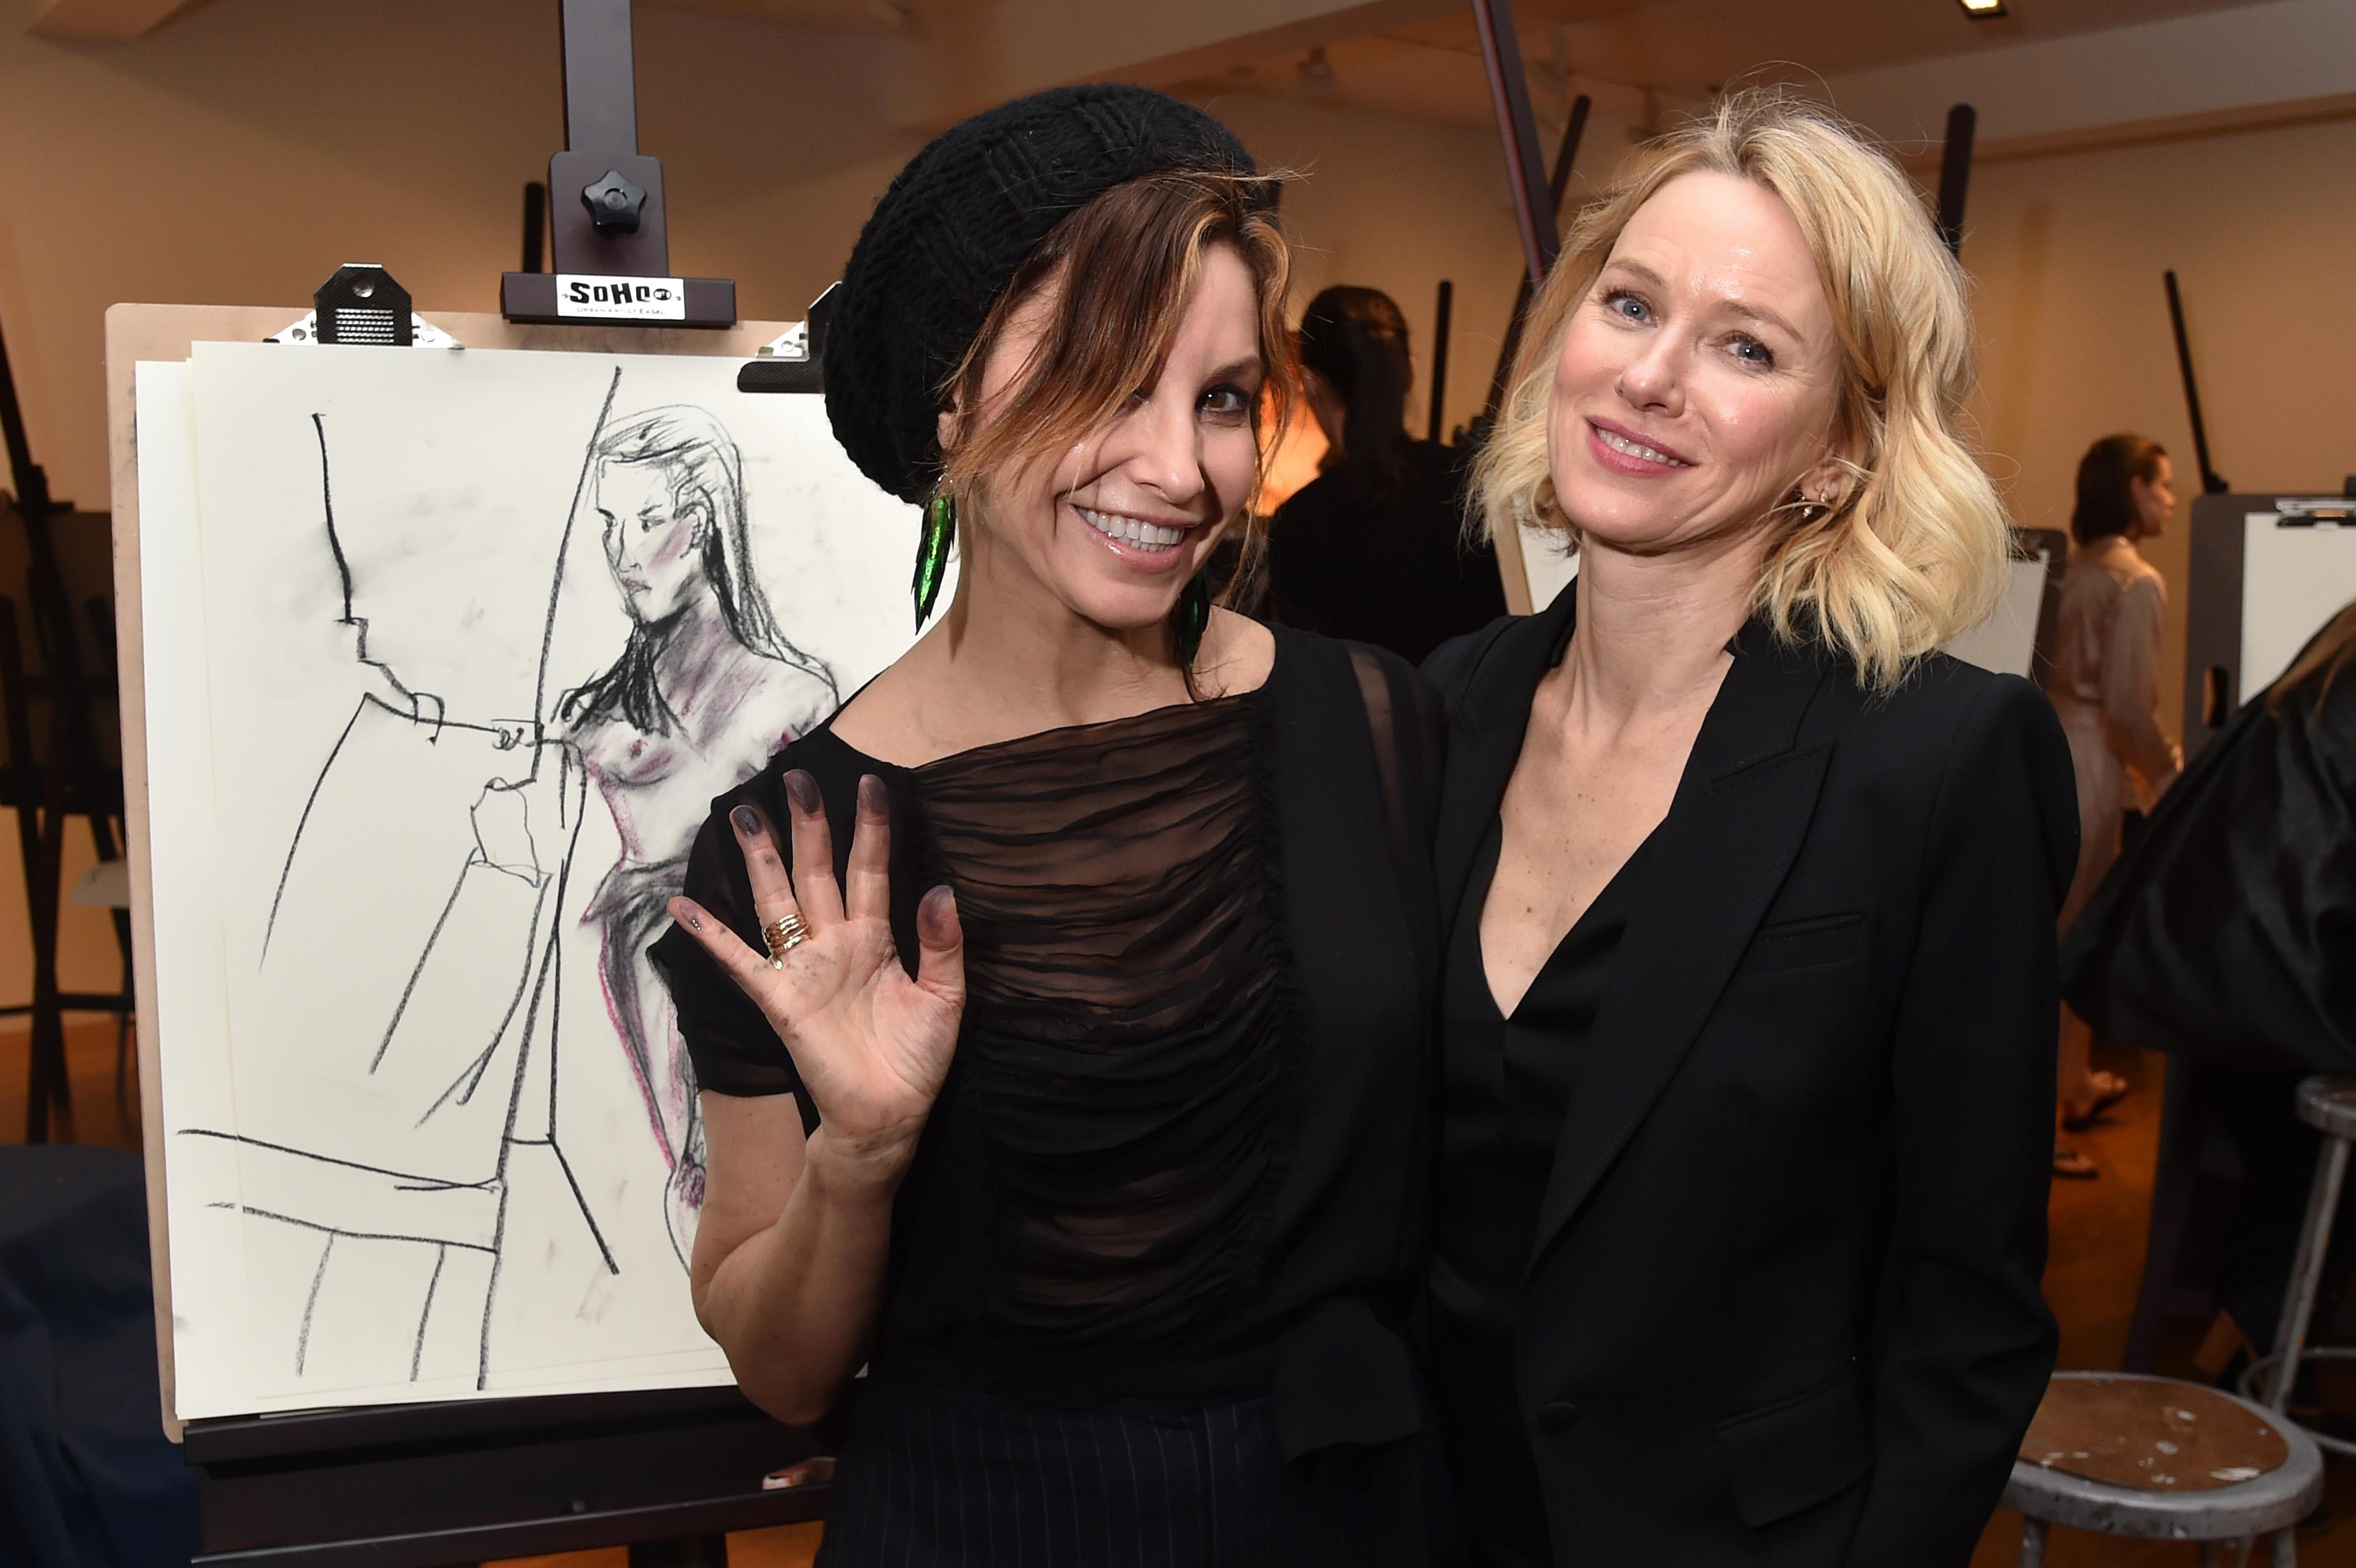 Gina Gershon and Naomi WattsNew York Academy Of Art Intimate Drawing Party, New York, USA - 06 Feb 2018